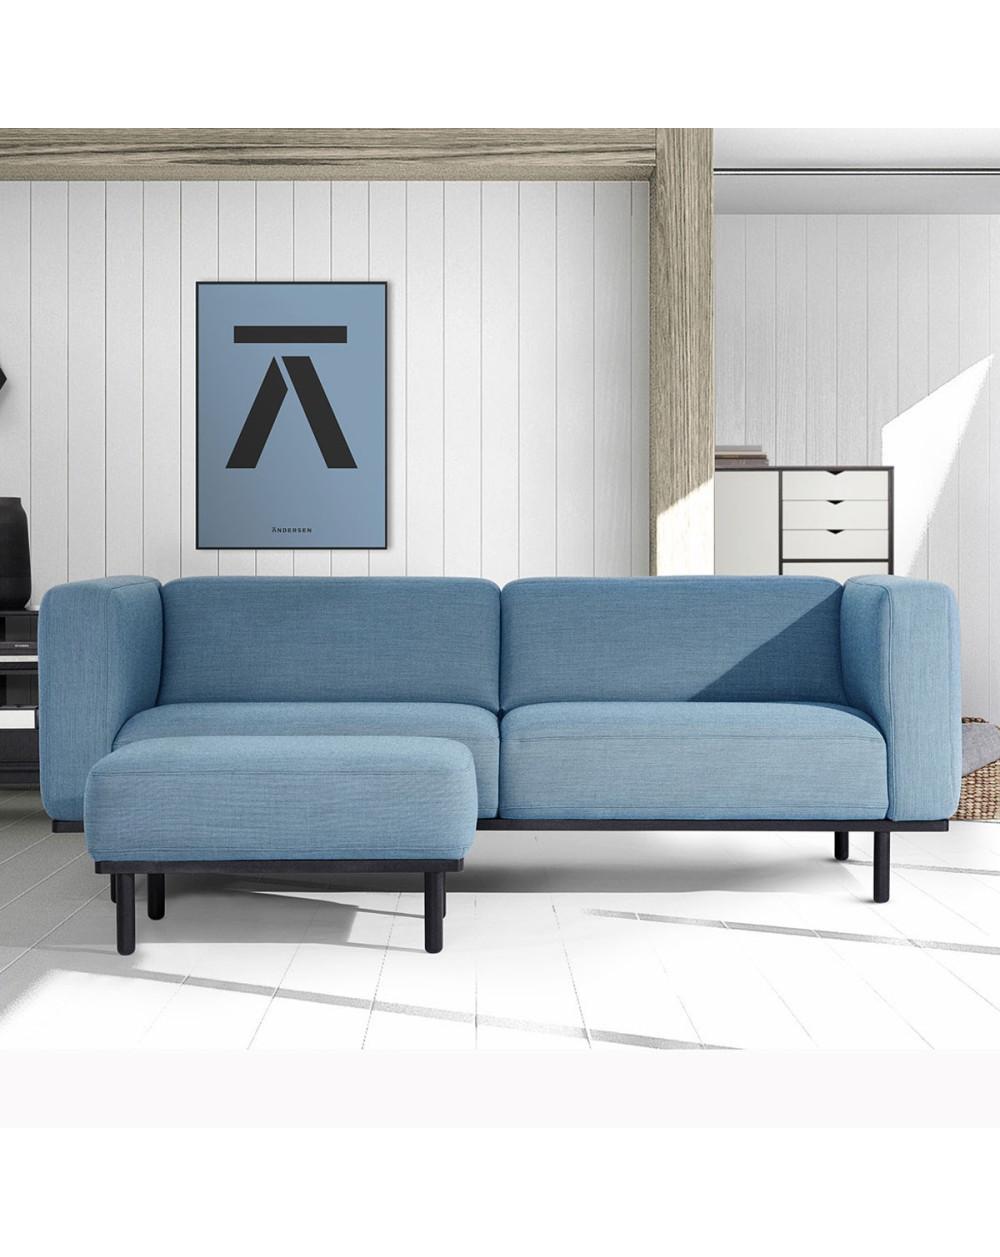 A1 sofa, byKATO for Andersen